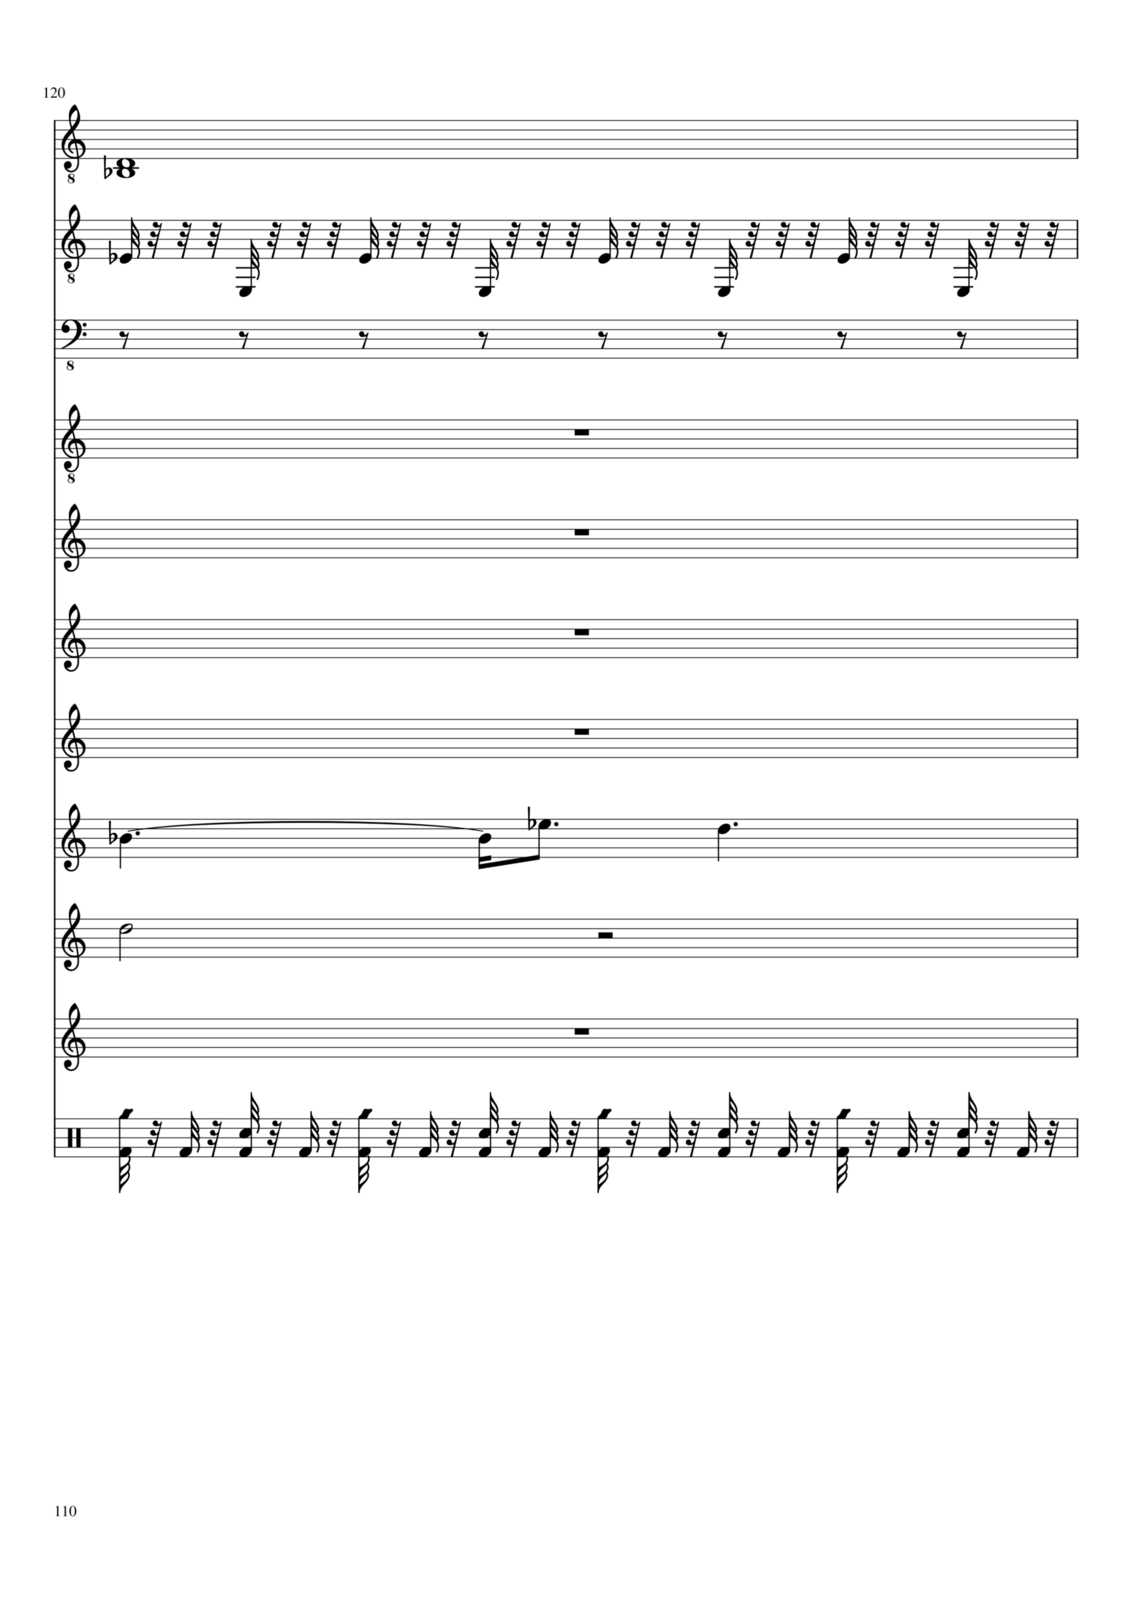 Belyiy sokol slide, Image 110